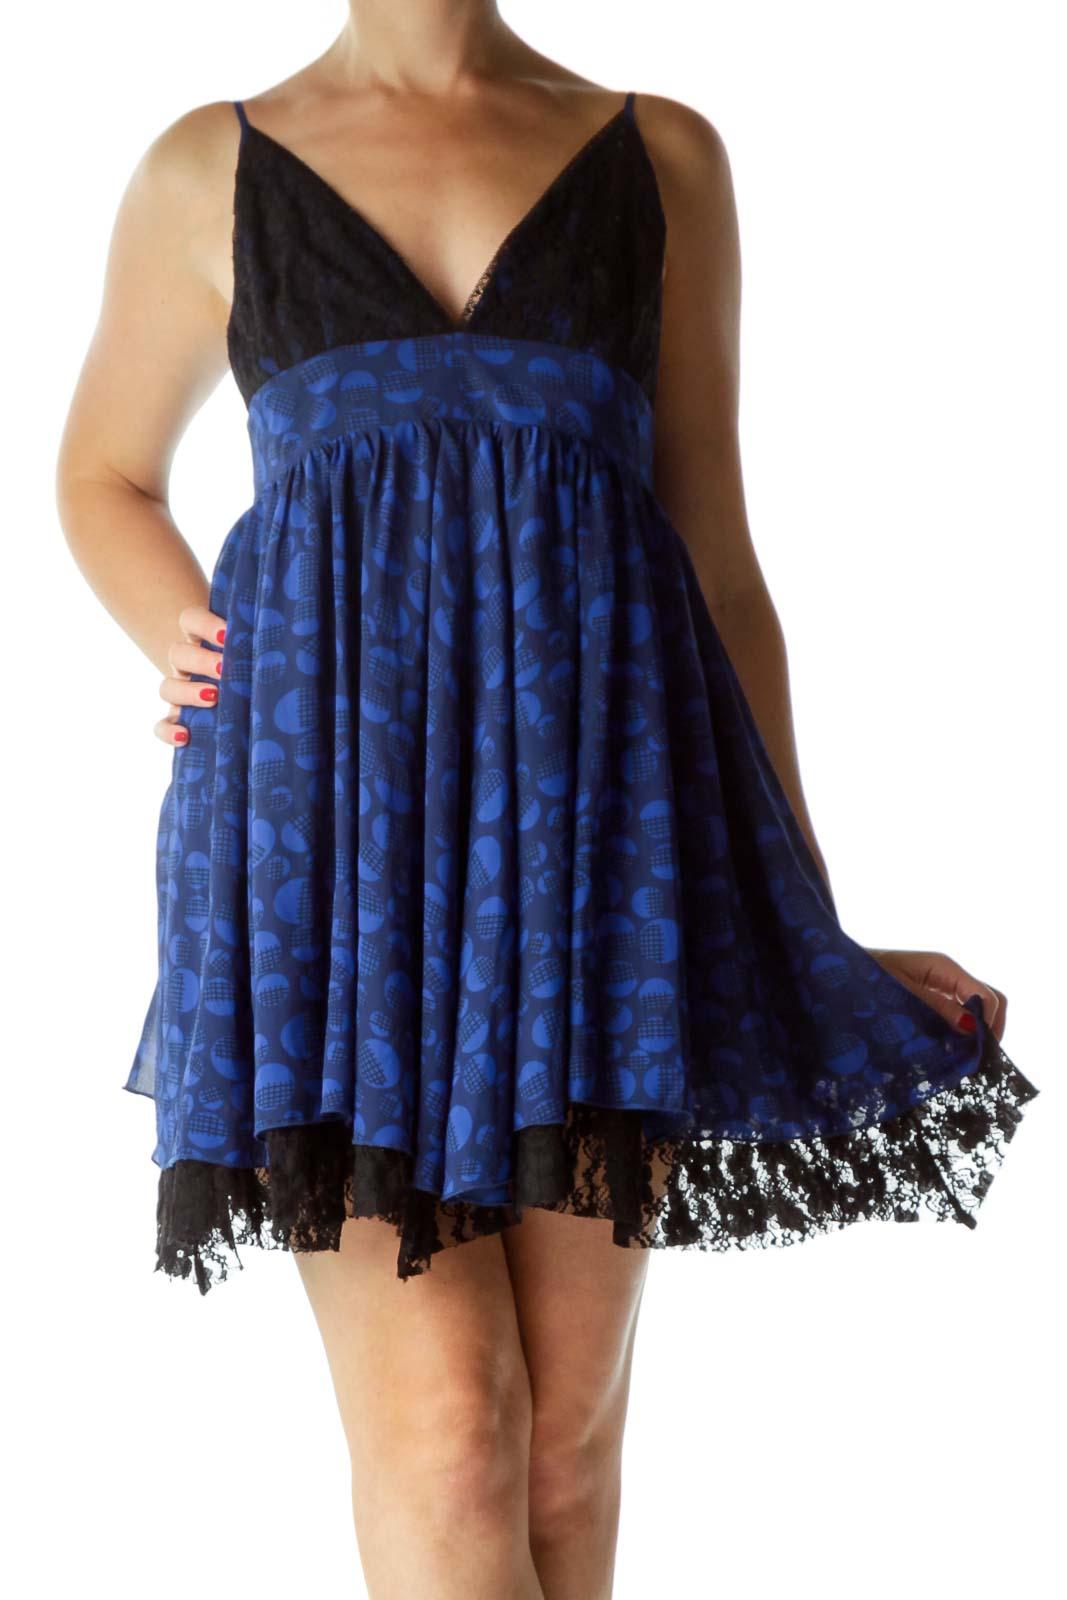 Blue Black Laced Printed Spaghetti Strap Dress